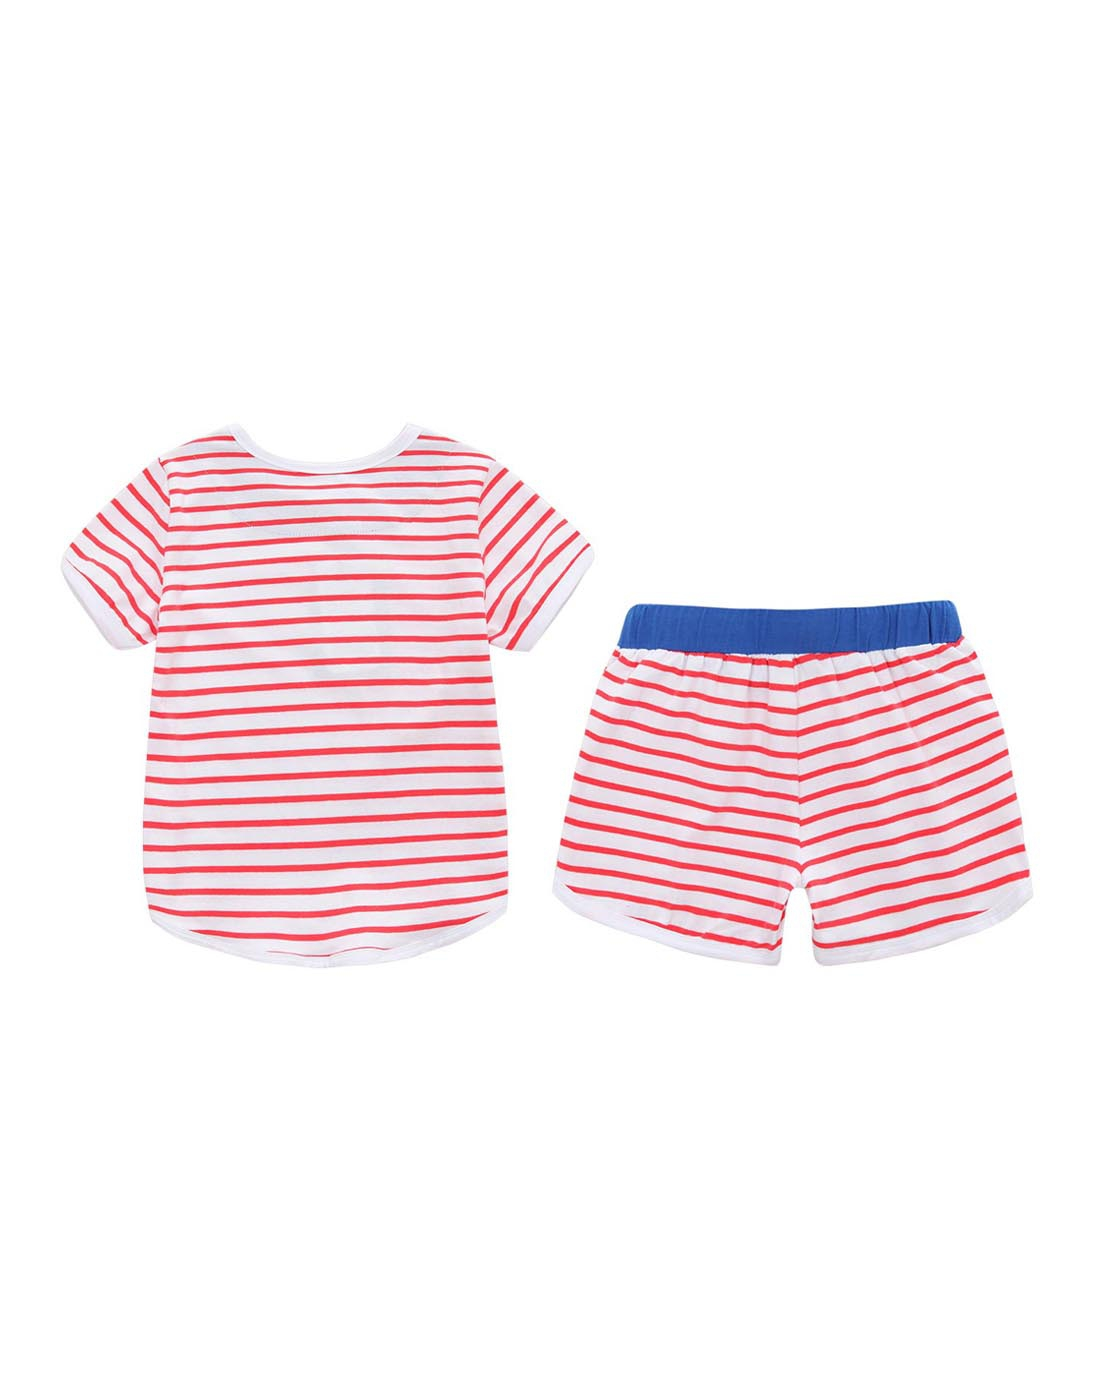 kids男女童女童红白条纹套装gt